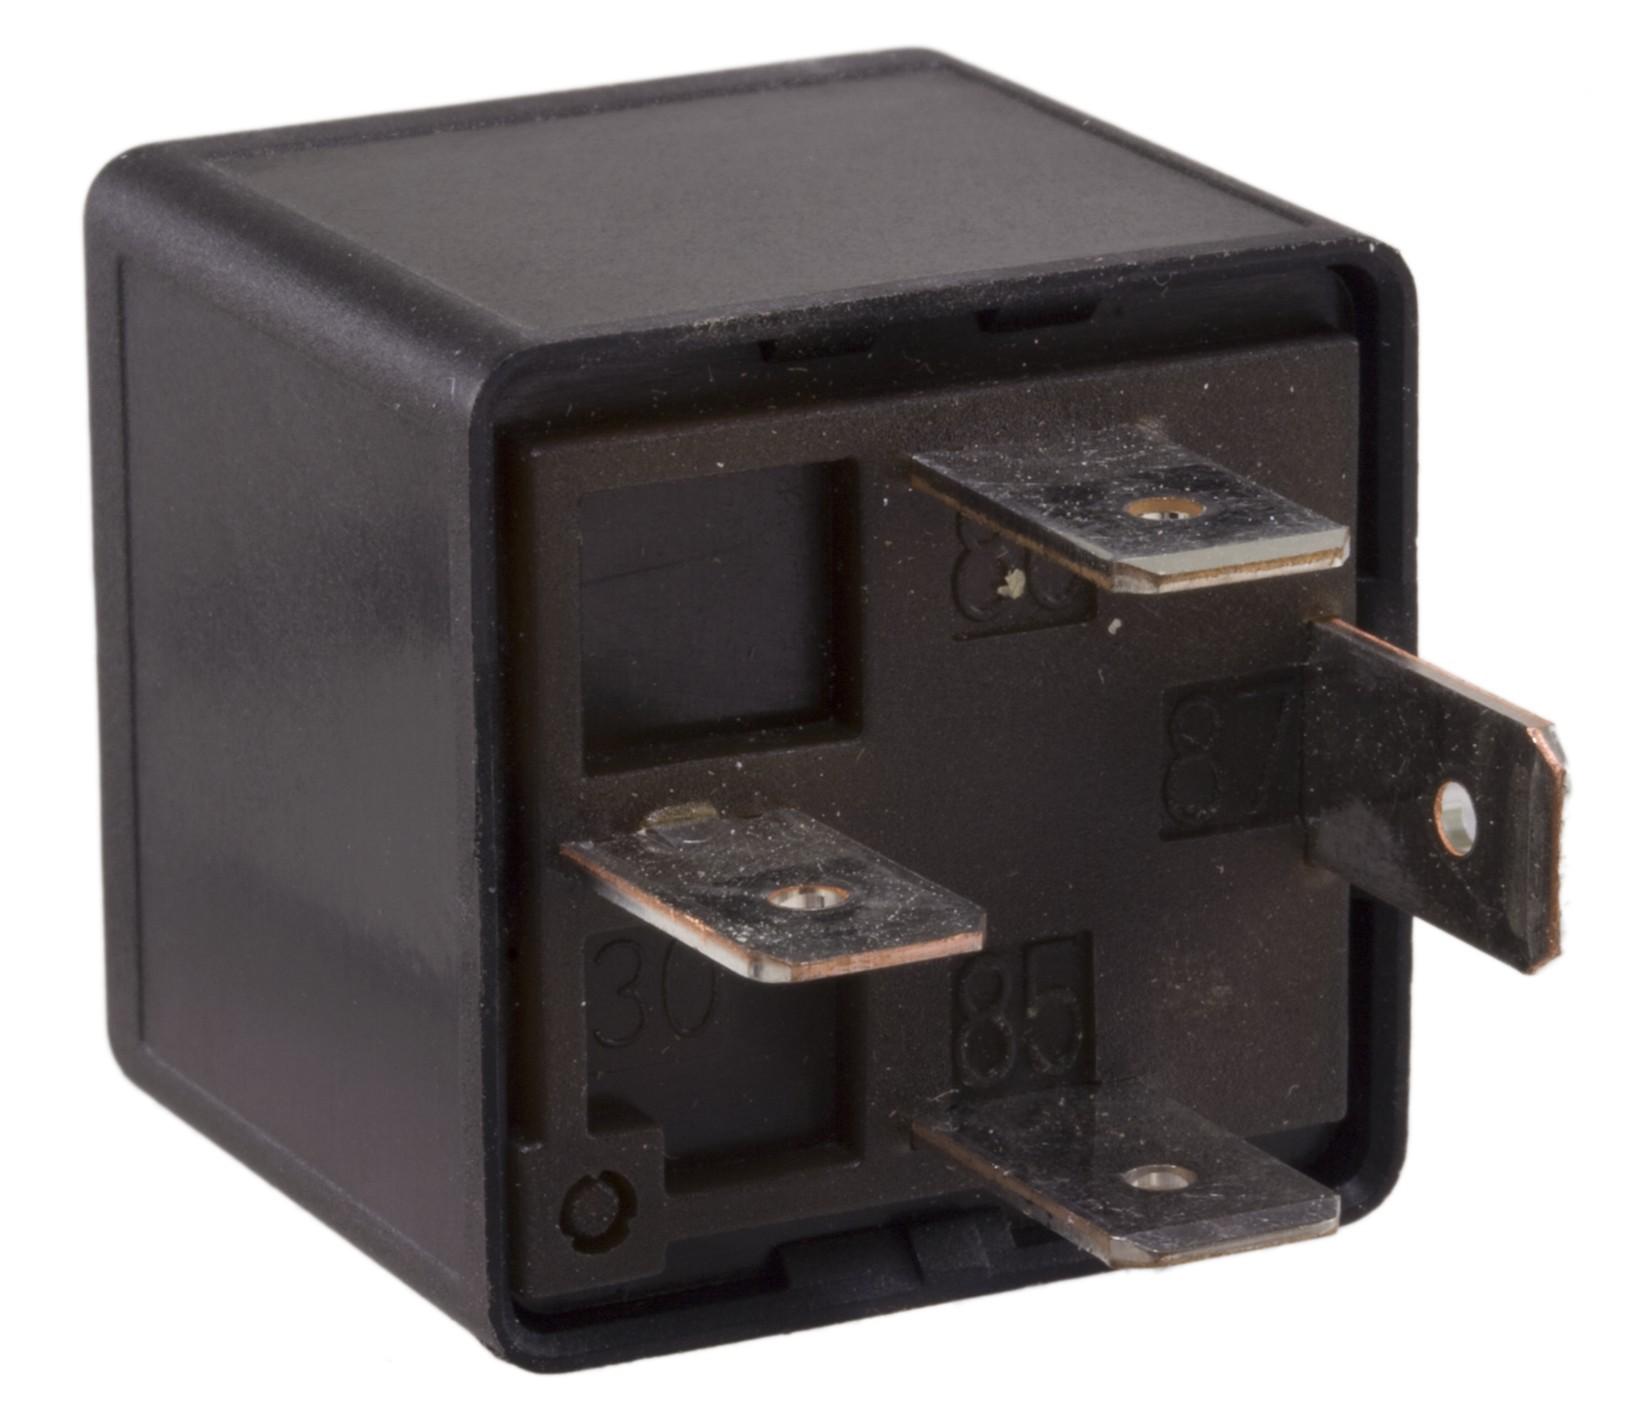 AIRTEX ENG MGMT SYSTEMS(DELETE V24A01R1) - Starter Relay - AEM 1R2009